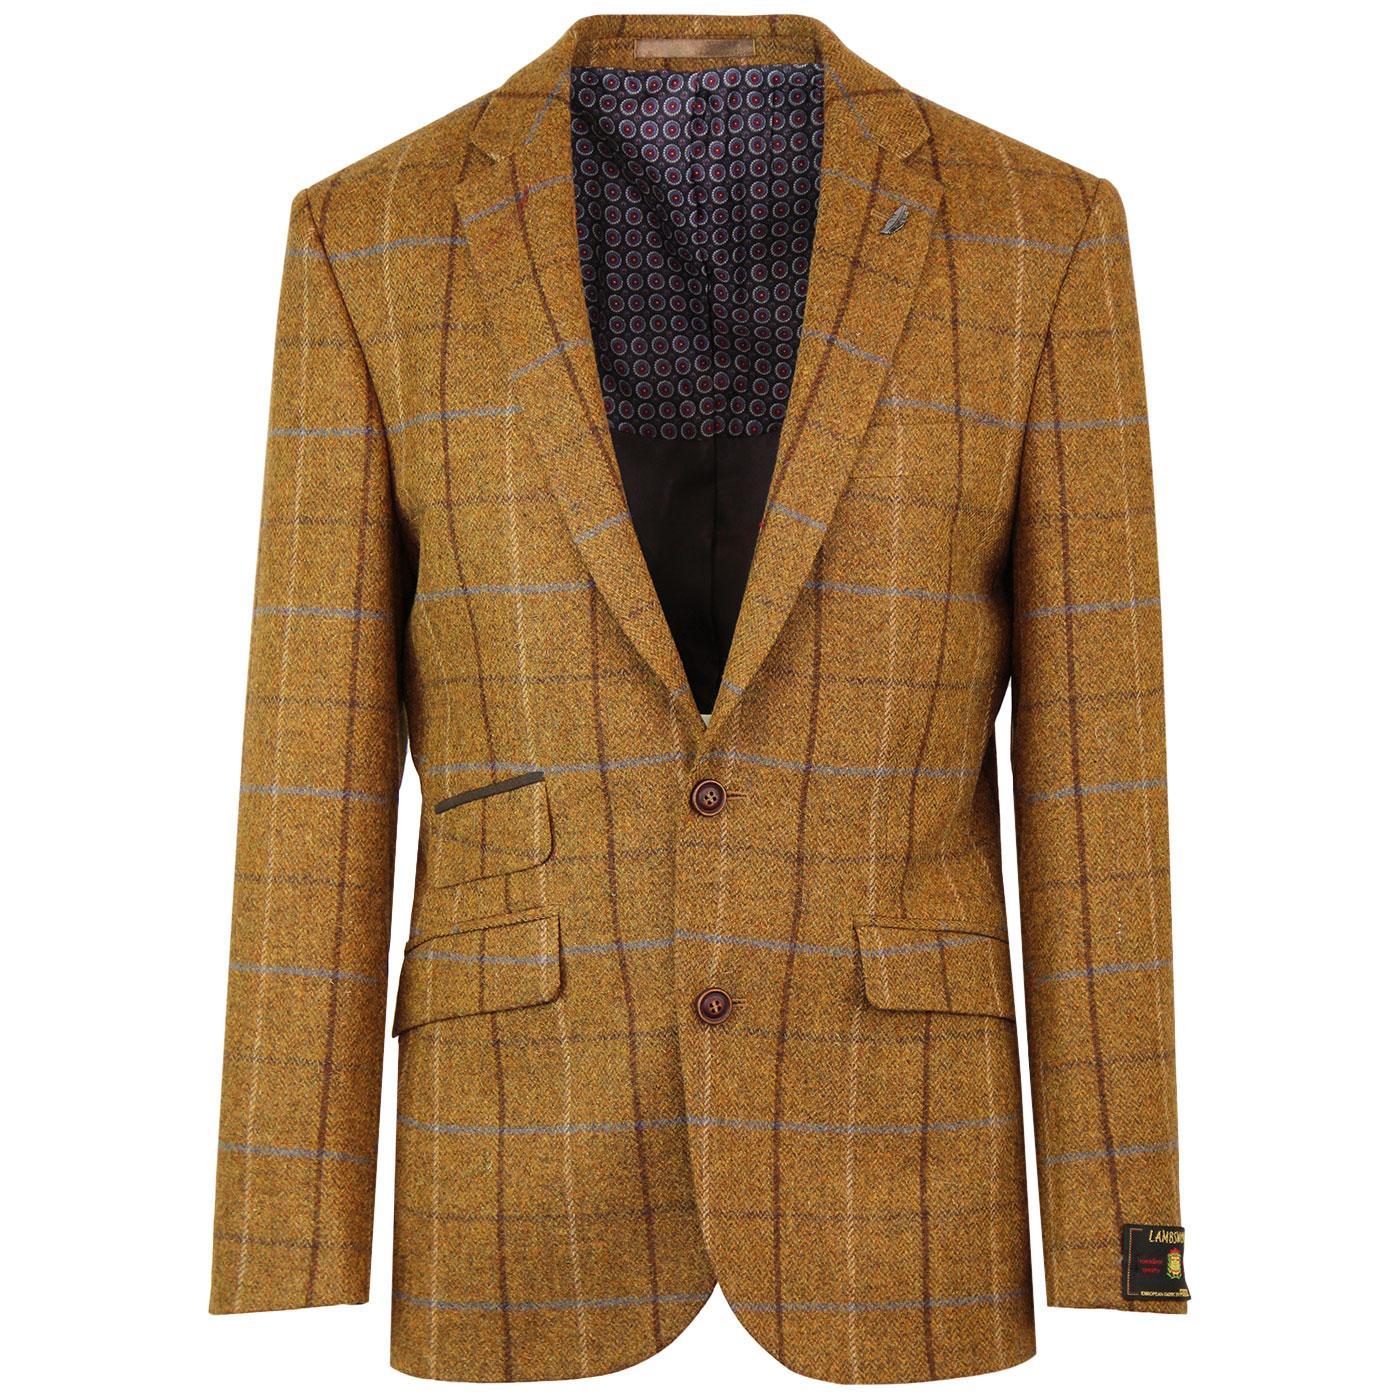 Mod Four Colour Gold Check Tailored Blazer Jacket